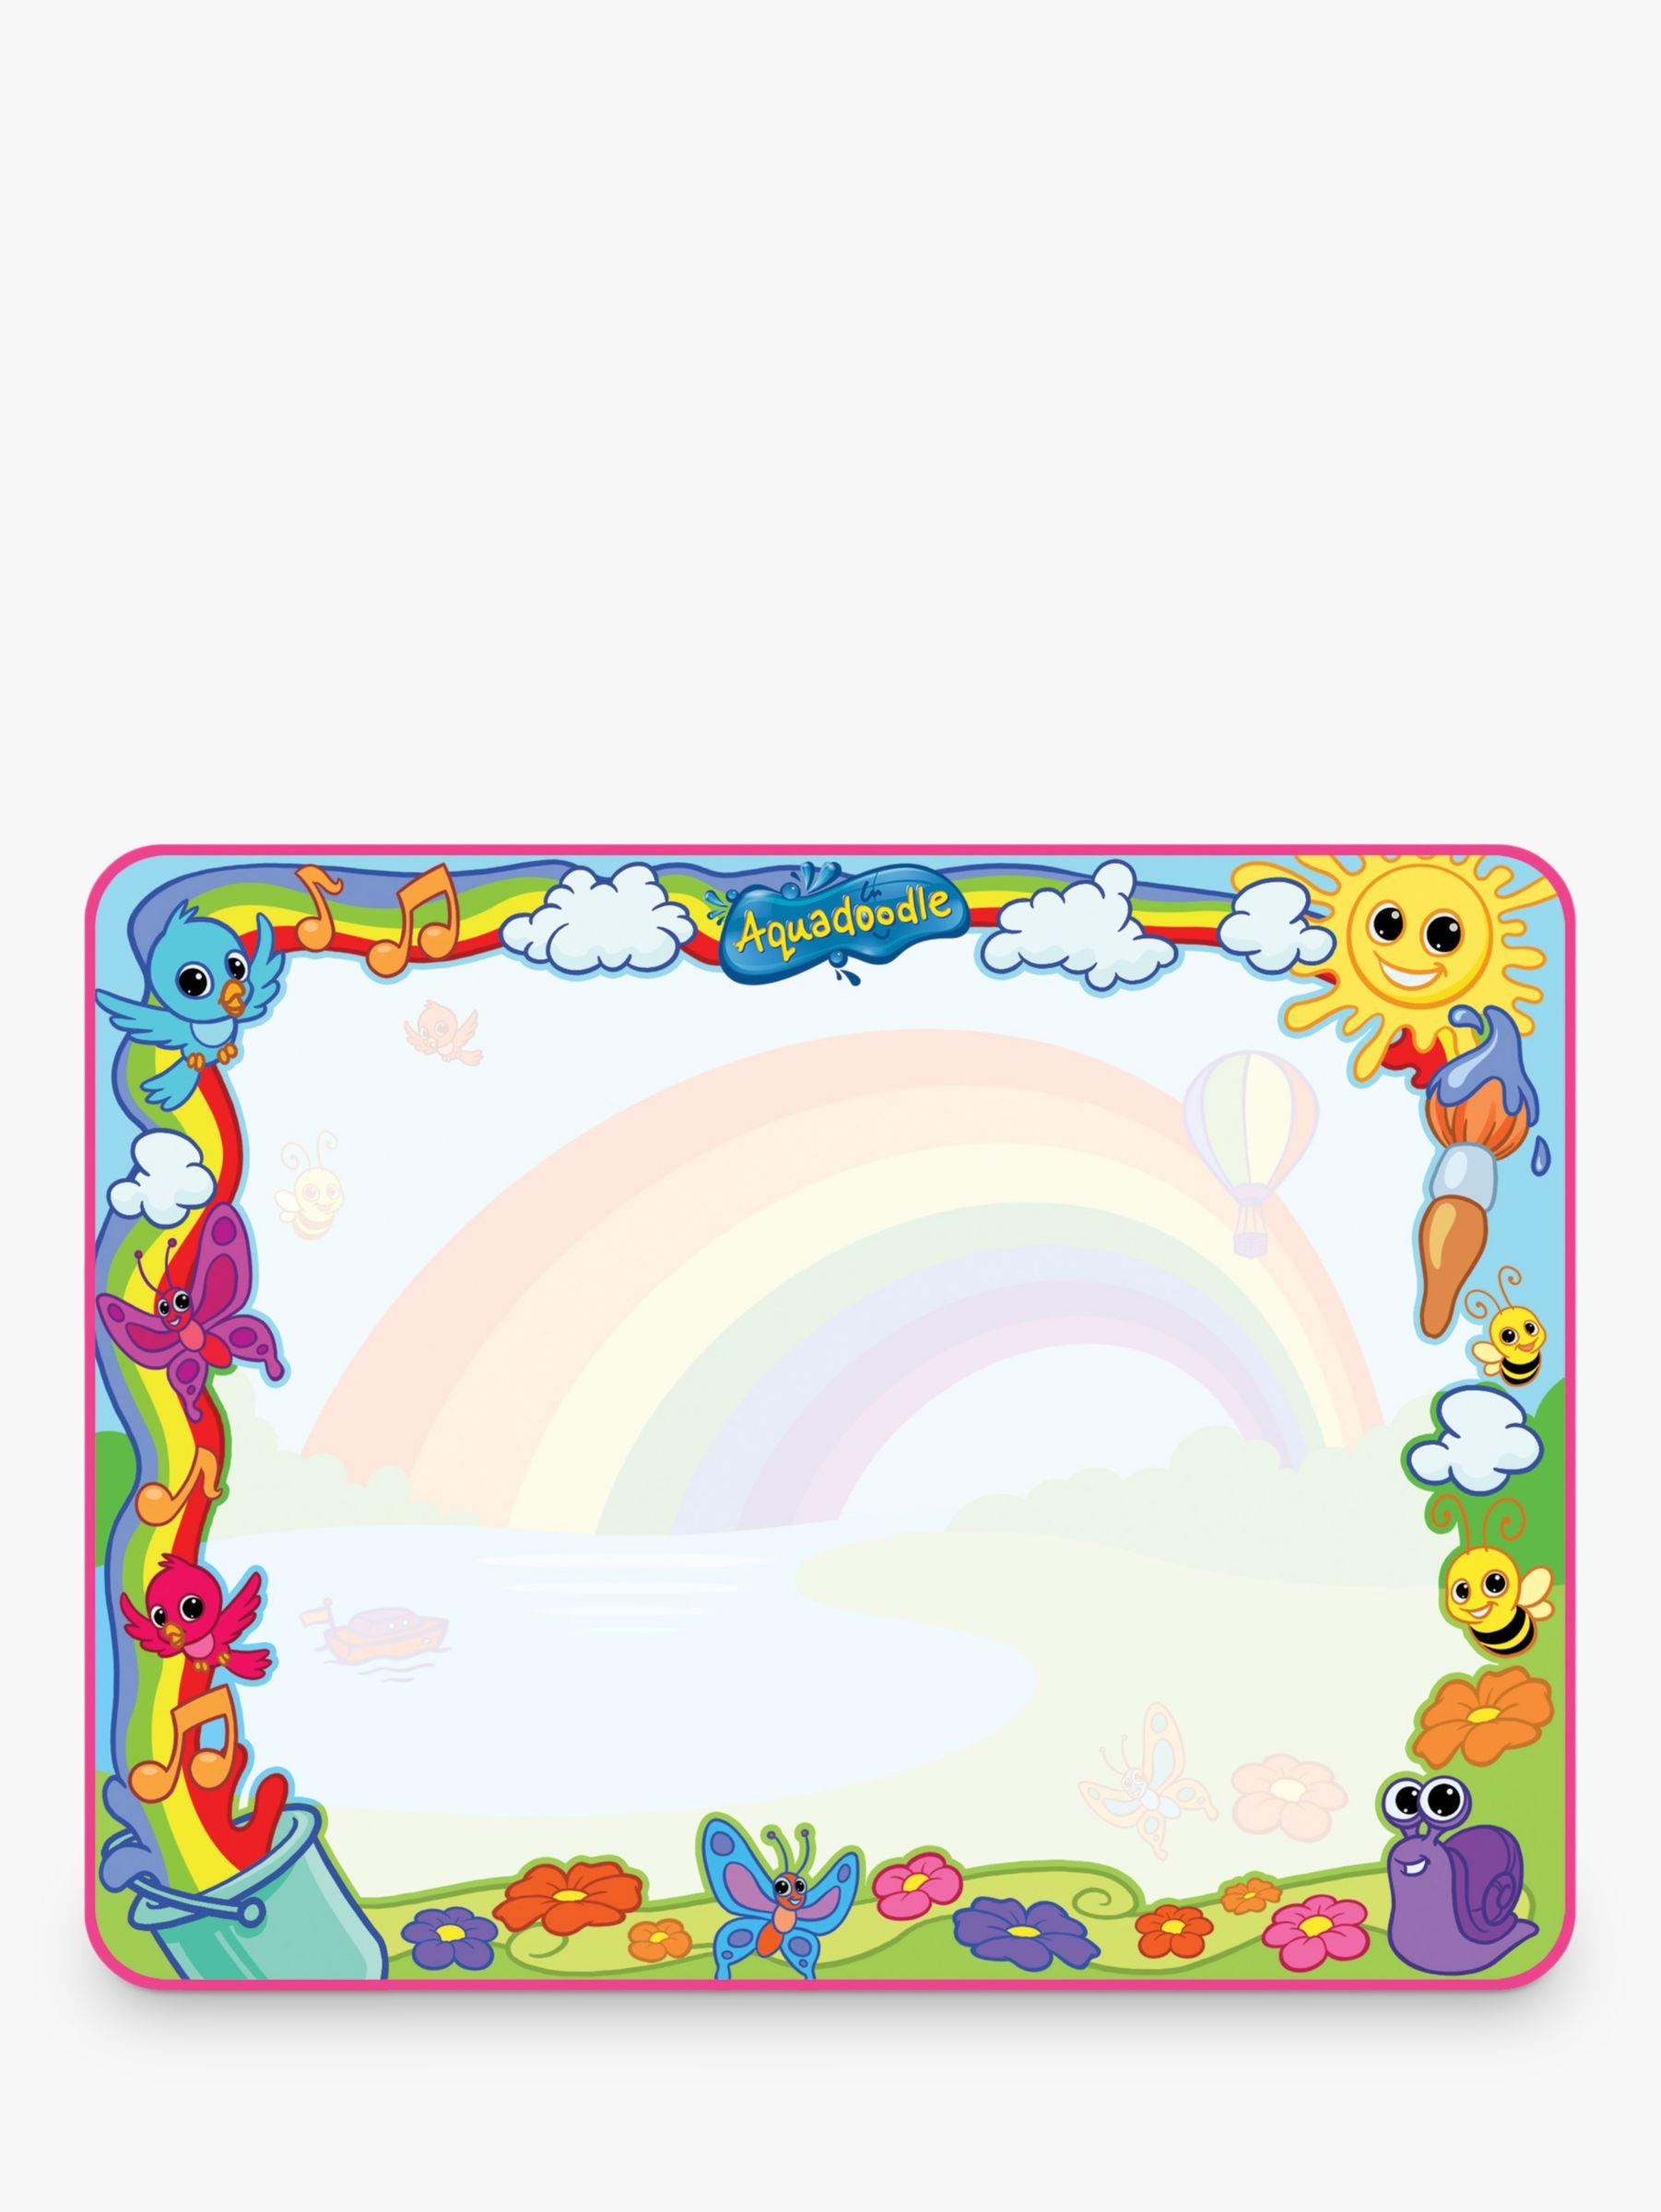 Tomy Aquadoodle Super Rainbow Deluxe Board